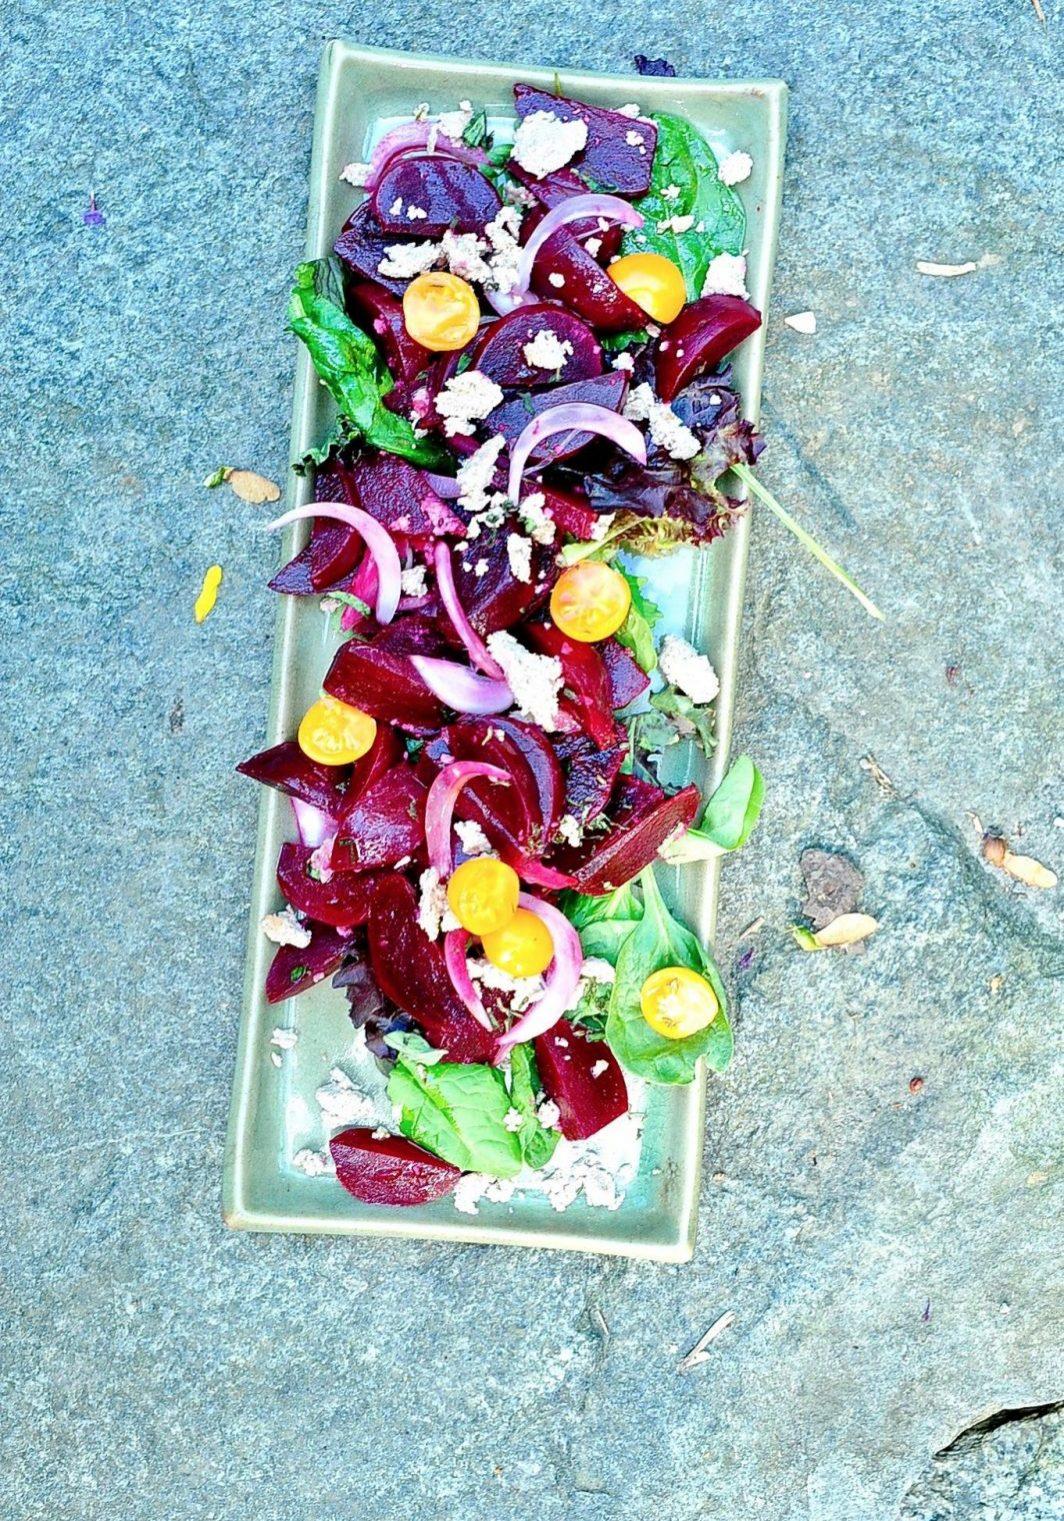 Roasted-Beet-Salad-with-Lemon-Dressing-and-Vegan-Feta-5